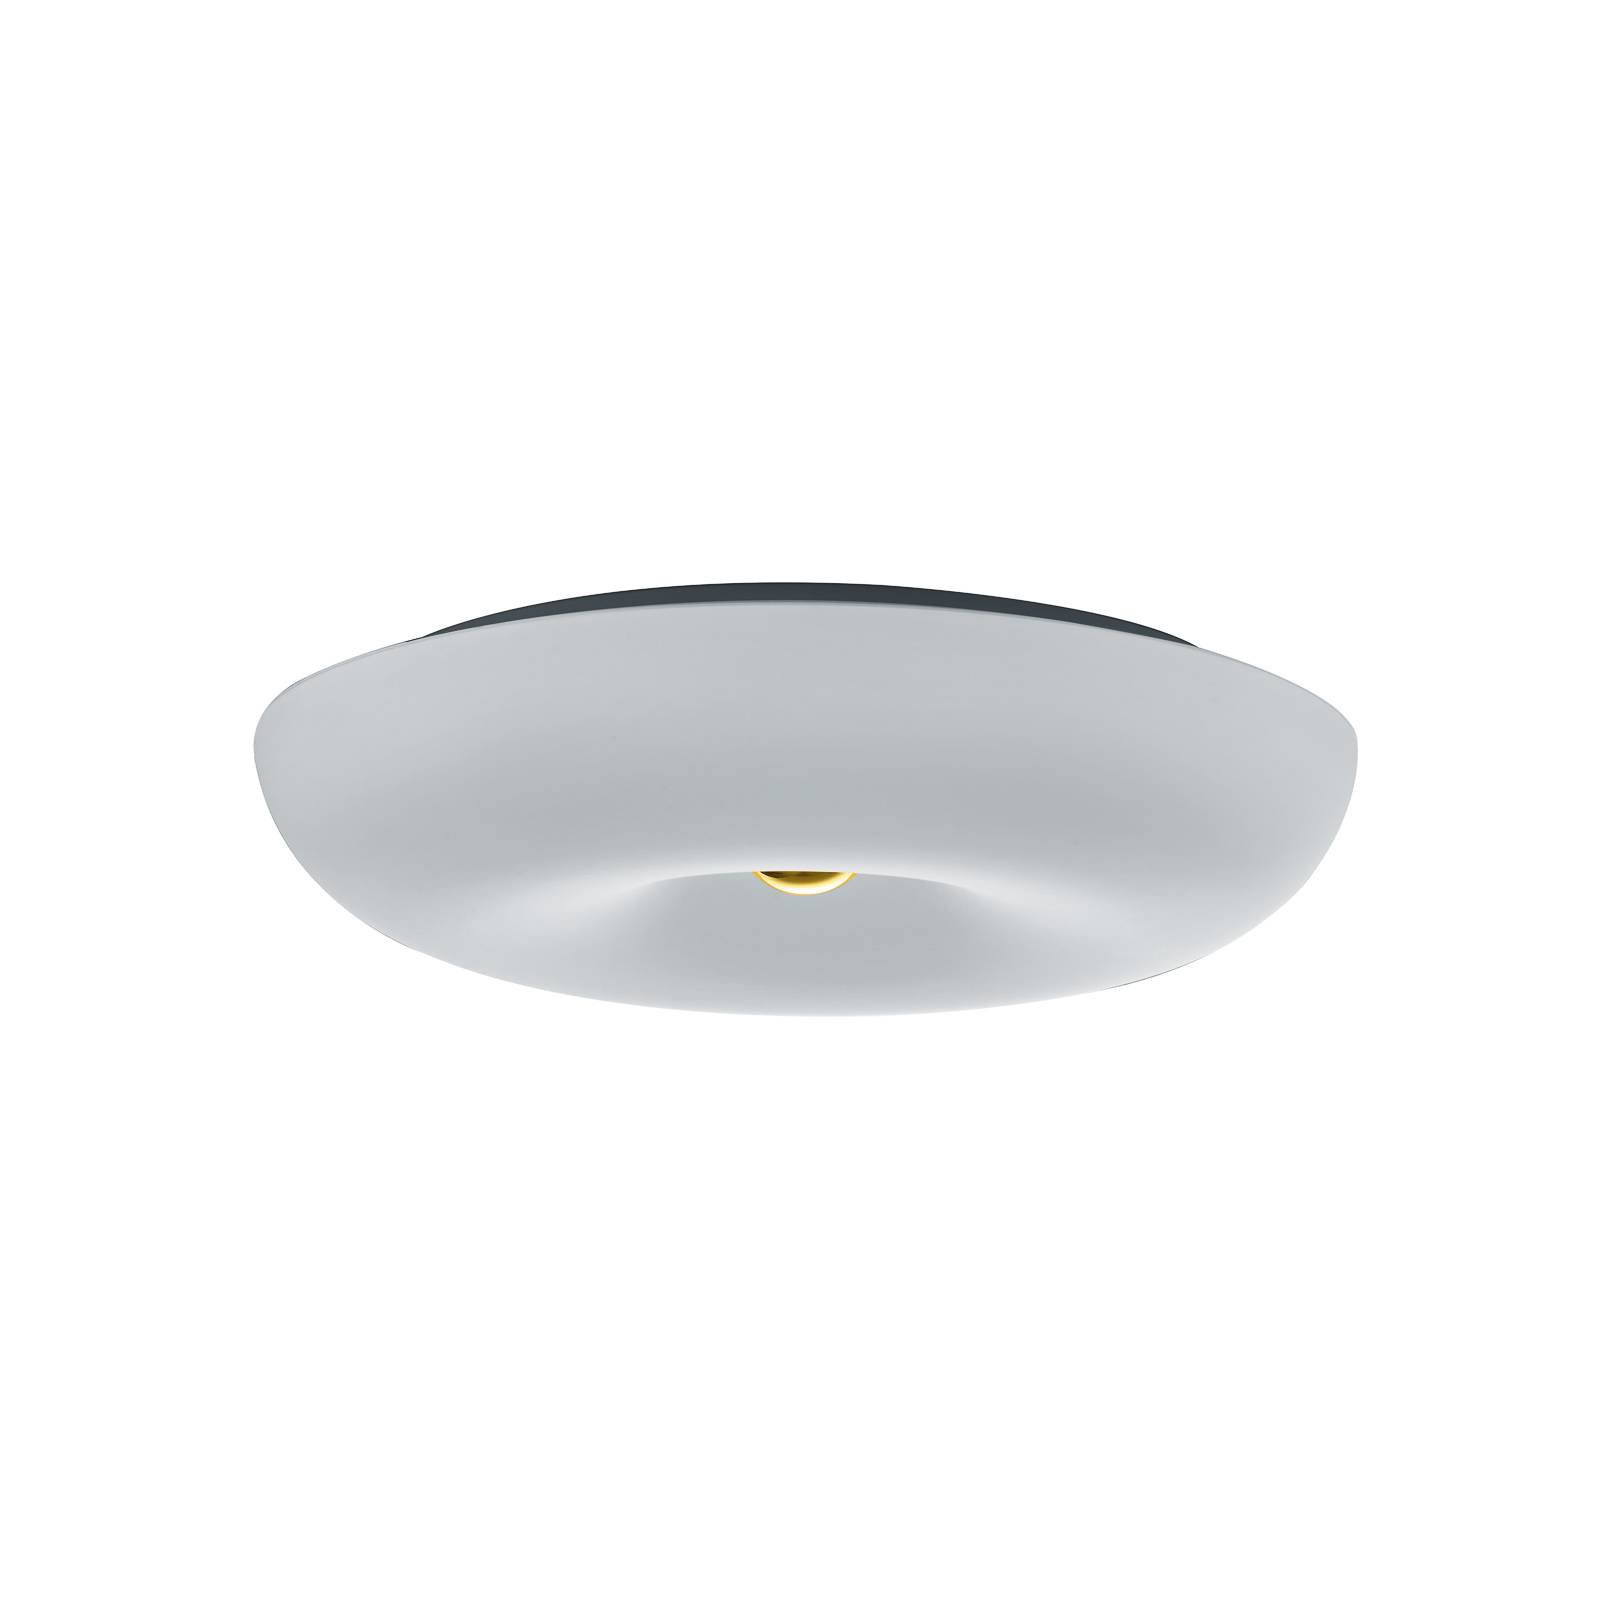 BANKAMP Vanity glass-taklampe LED, messing